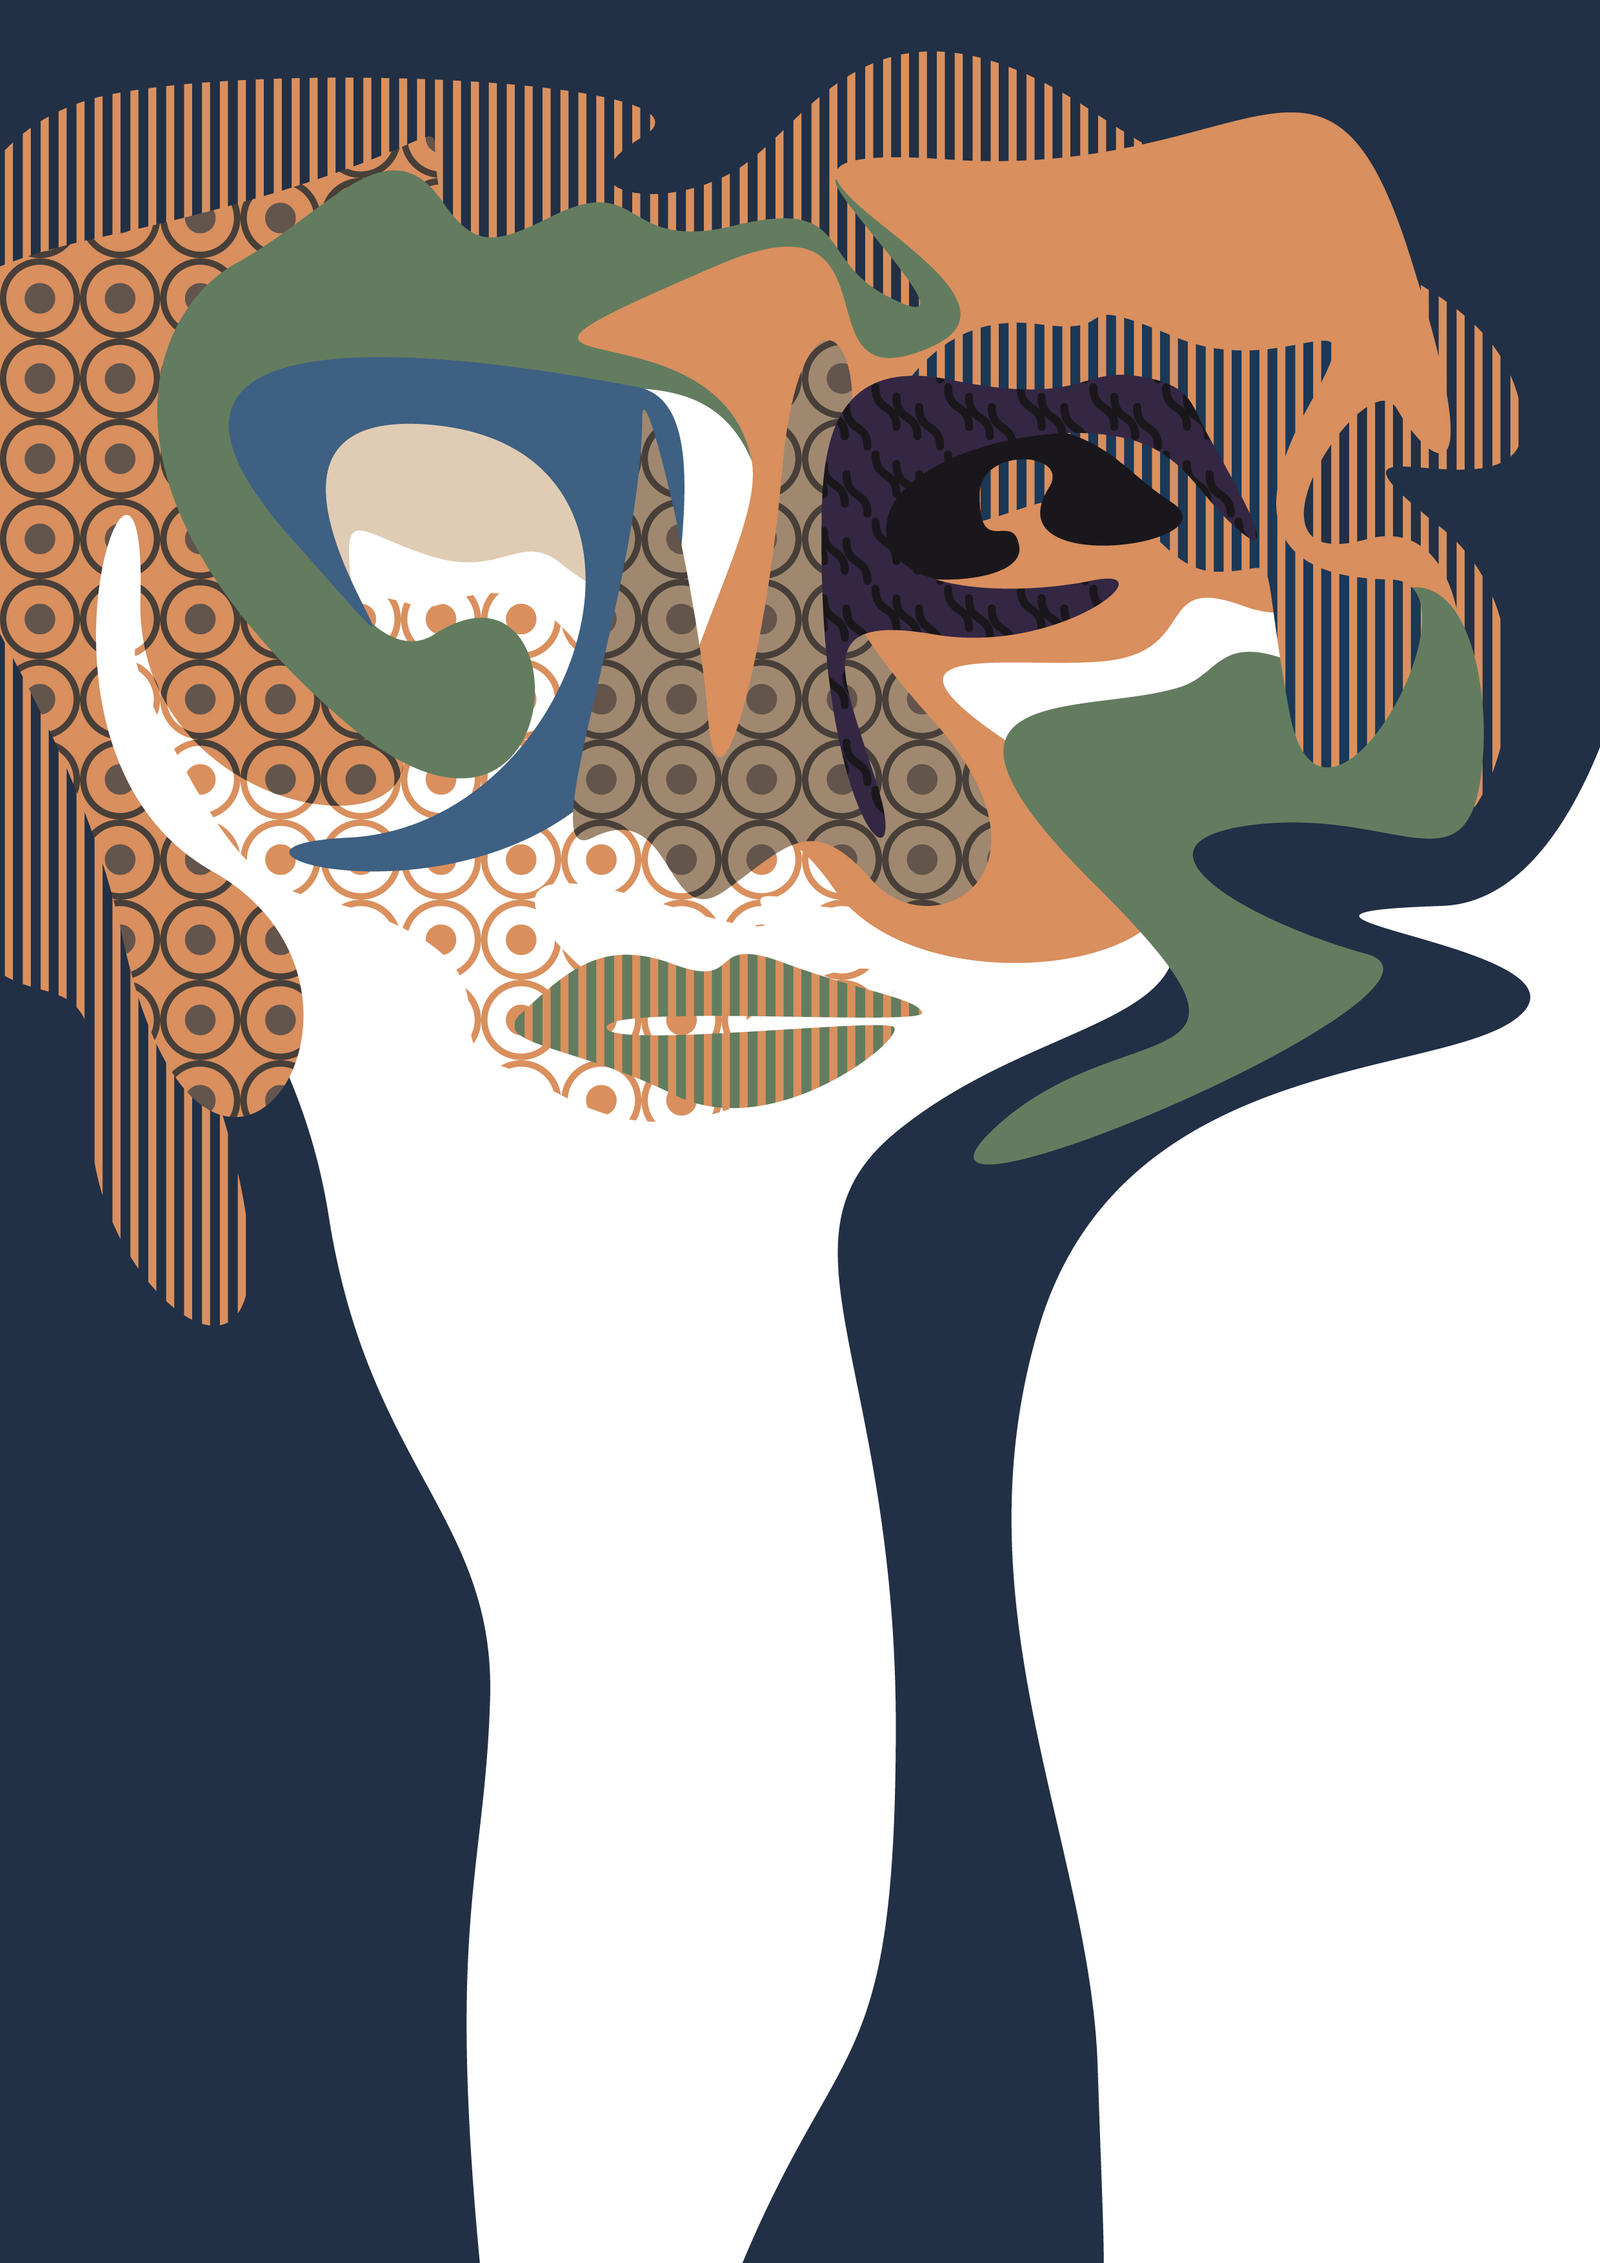 Muster Typi by Fra-Ka